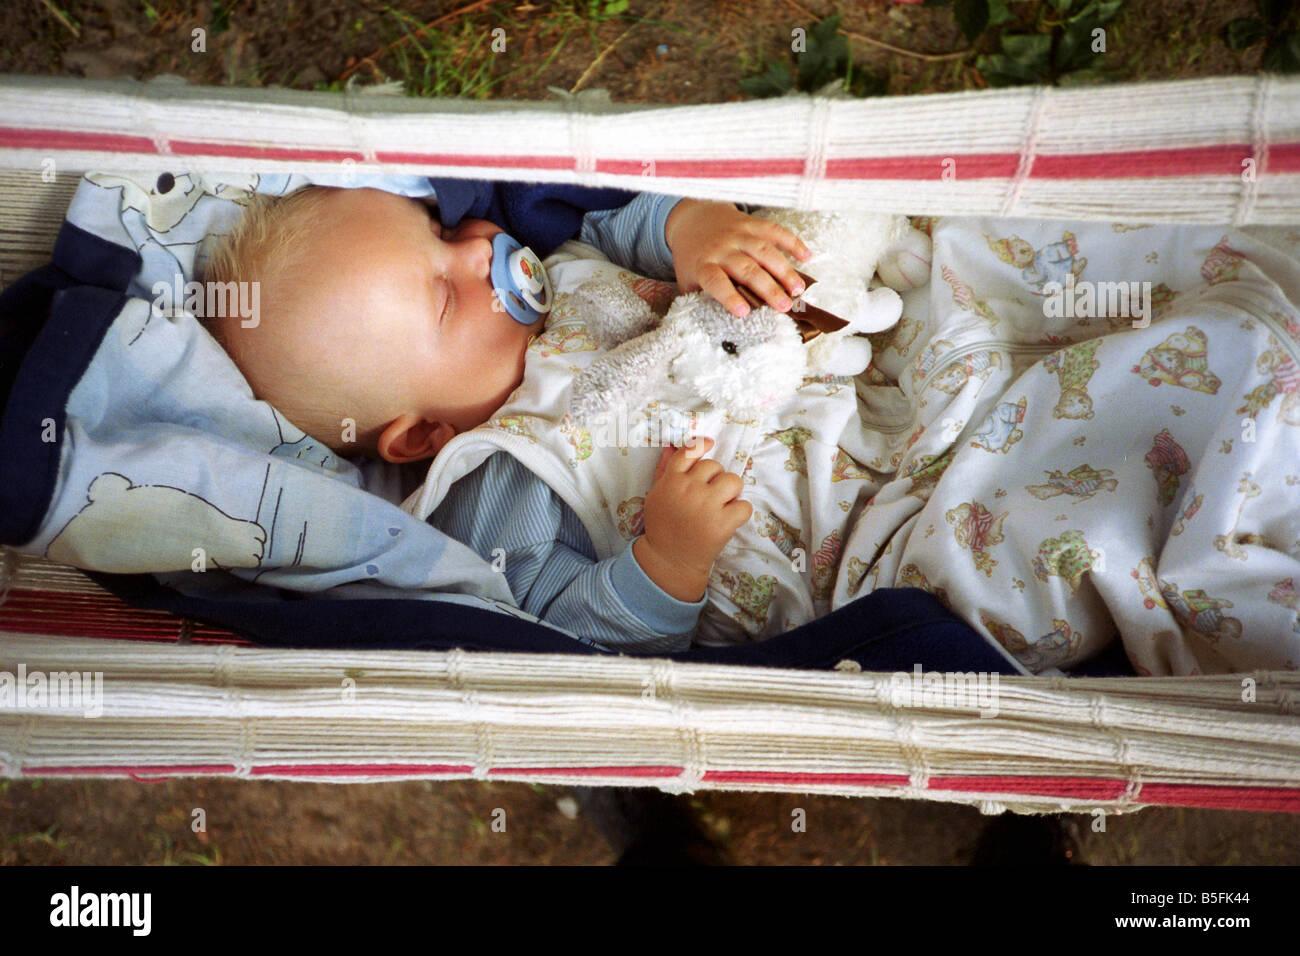 baby sleeping in a hammock baby sleeping in a hammock stock photo royalty free image      rh   alamy